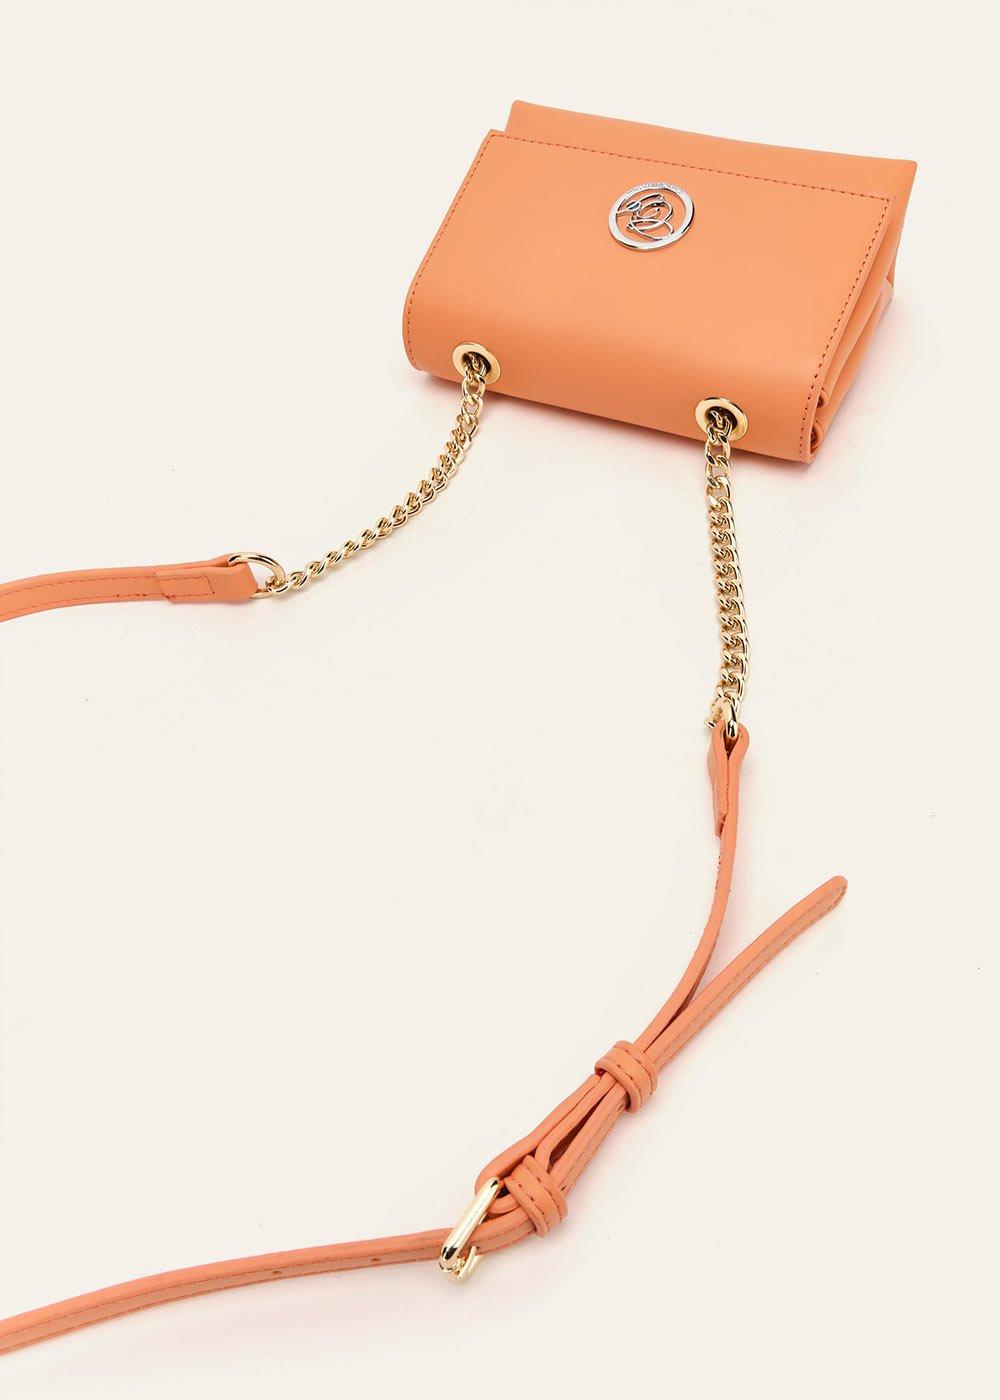 Bryana faux-leather clutch bag - Melon - Woman